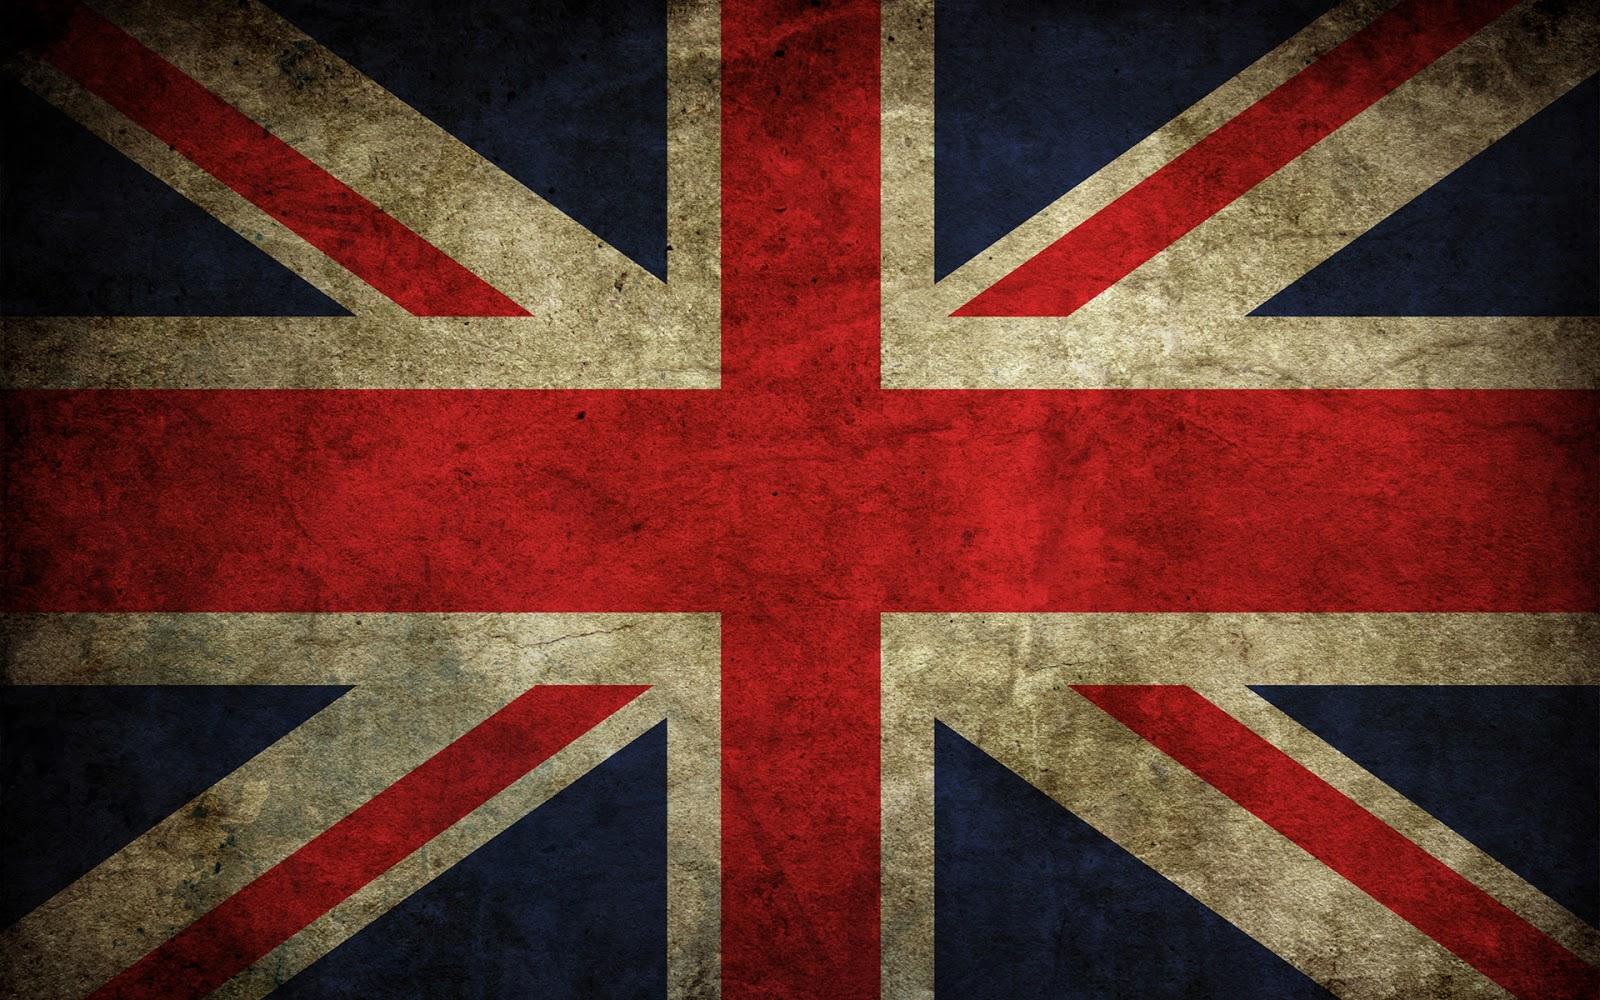 http://2.bp.blogspot.com/-EK6JqeBuHSg/TcG3srsvwvI/AAAAAAAAAe8/4IzVlcIG4ZA/s1600/British%20Flag%20Wallpapers.jpg